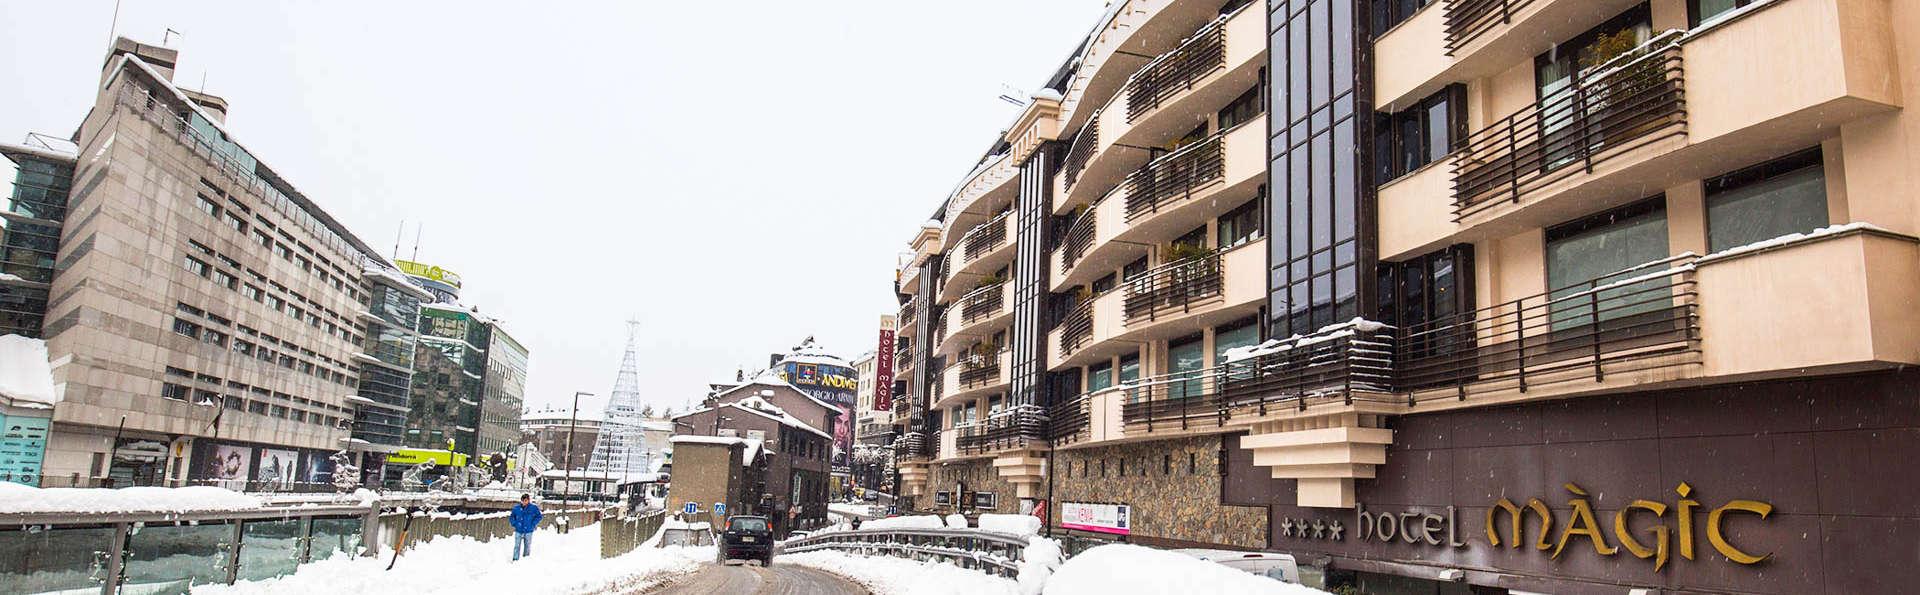 Magic Andorra - EDIT_Exterior_Winter_7.jpg